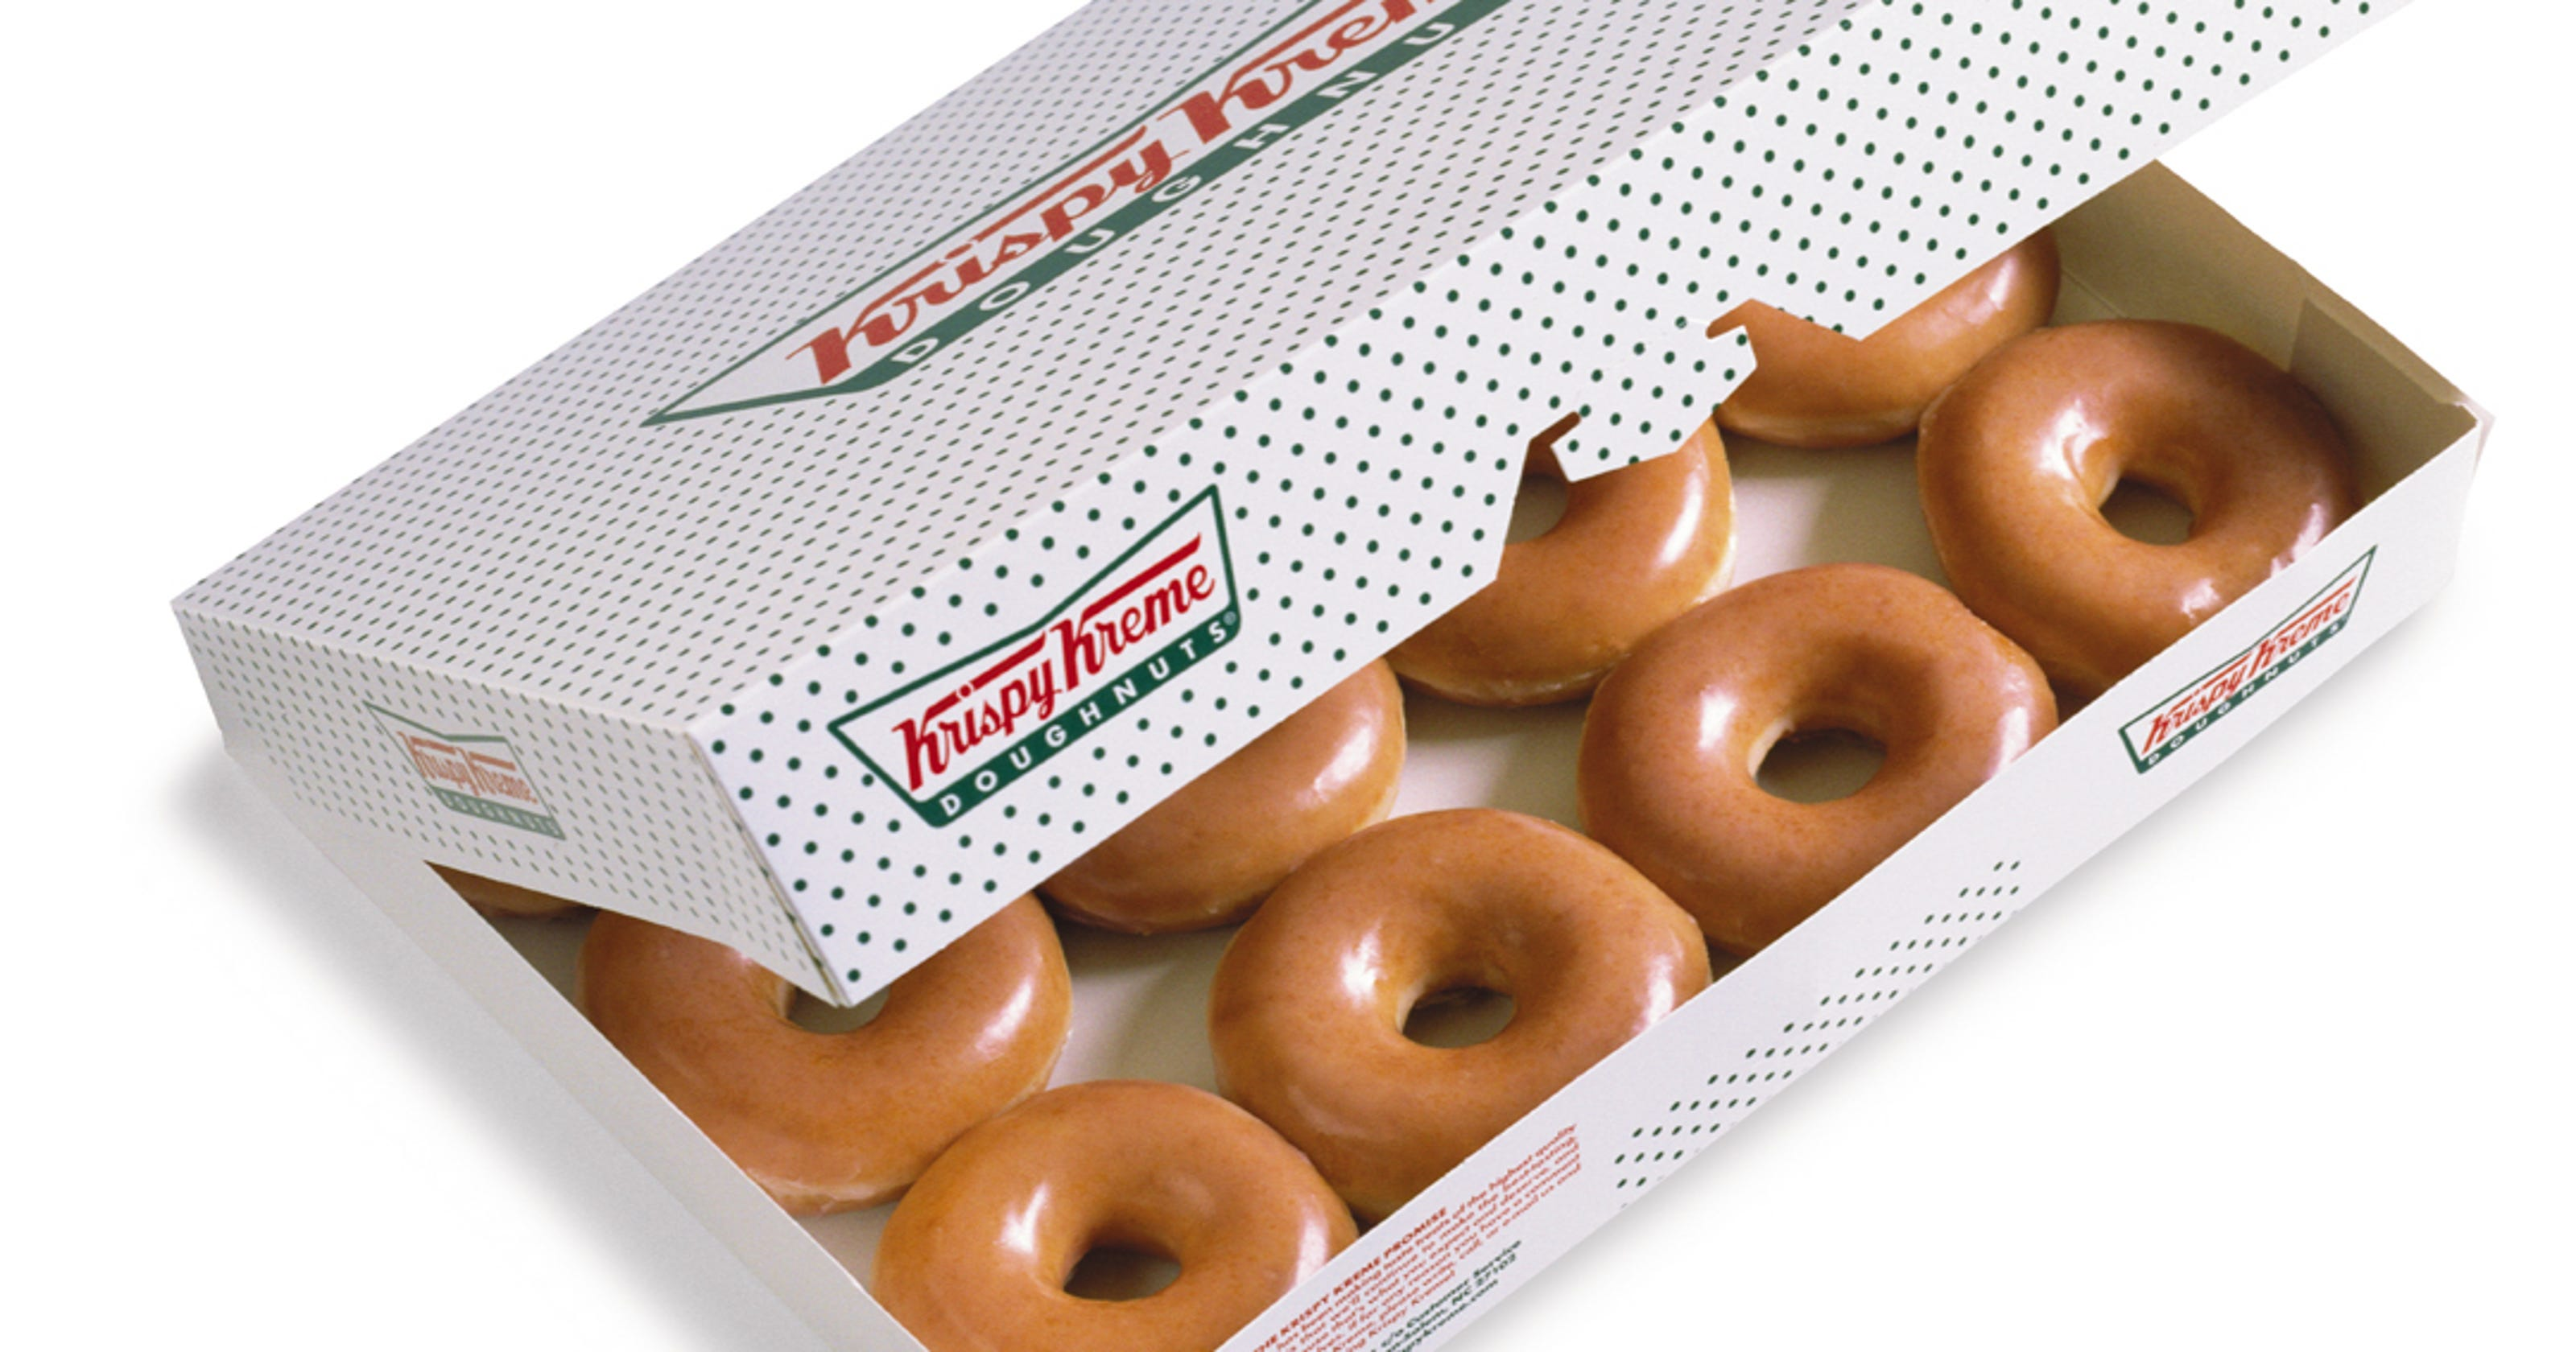 krispy kreme offers buy a dozen get a dozen for 1 on july 27 - Krispy Kreme Christmas Hours